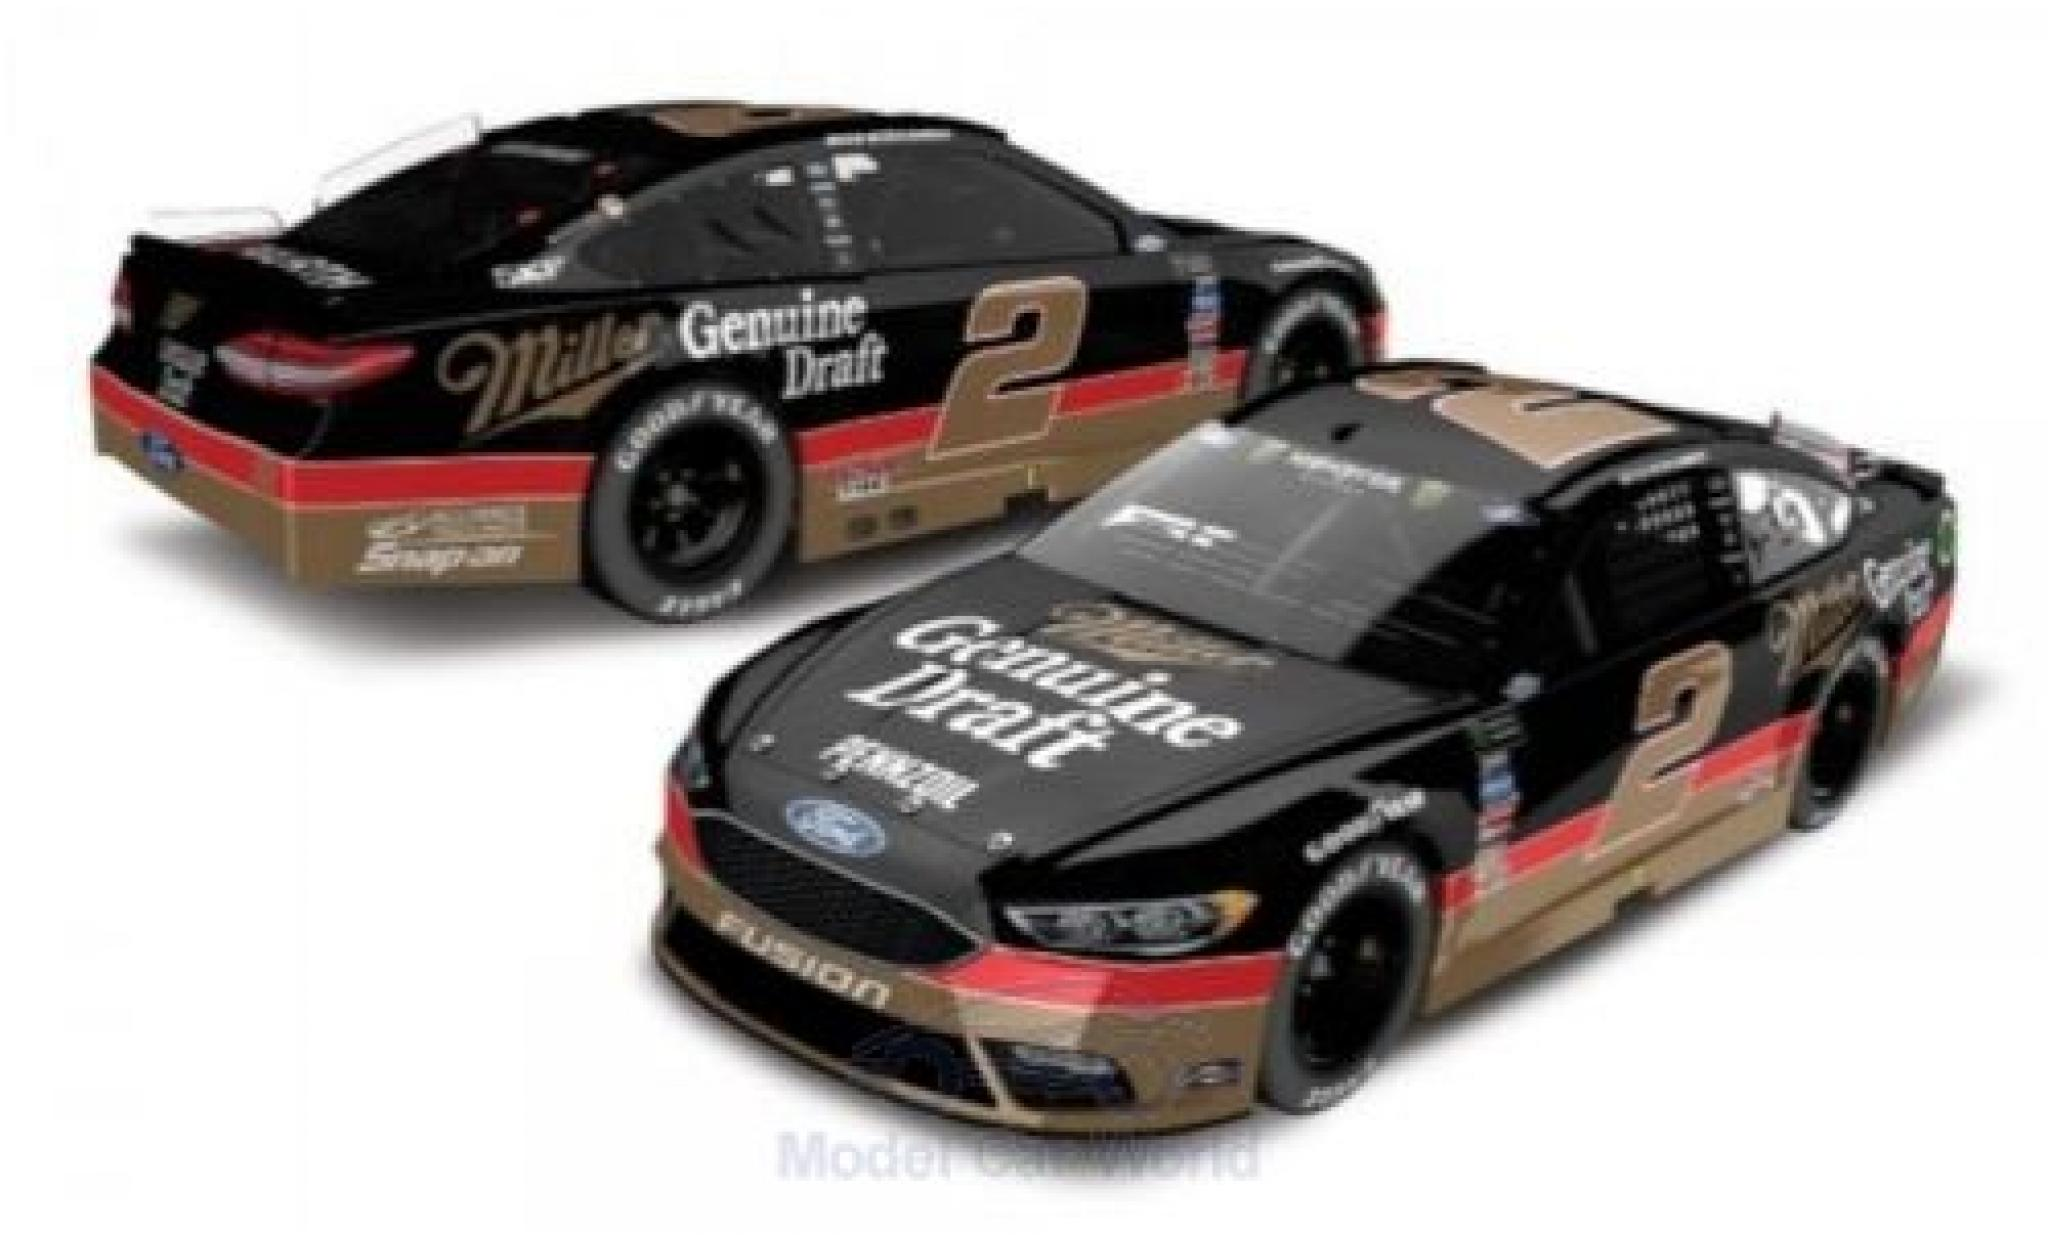 Ford Fusion 1/64 Lionel Racing No.2 Team Penske Miller Genuine Draft Nascar 2018 B.Keselowski